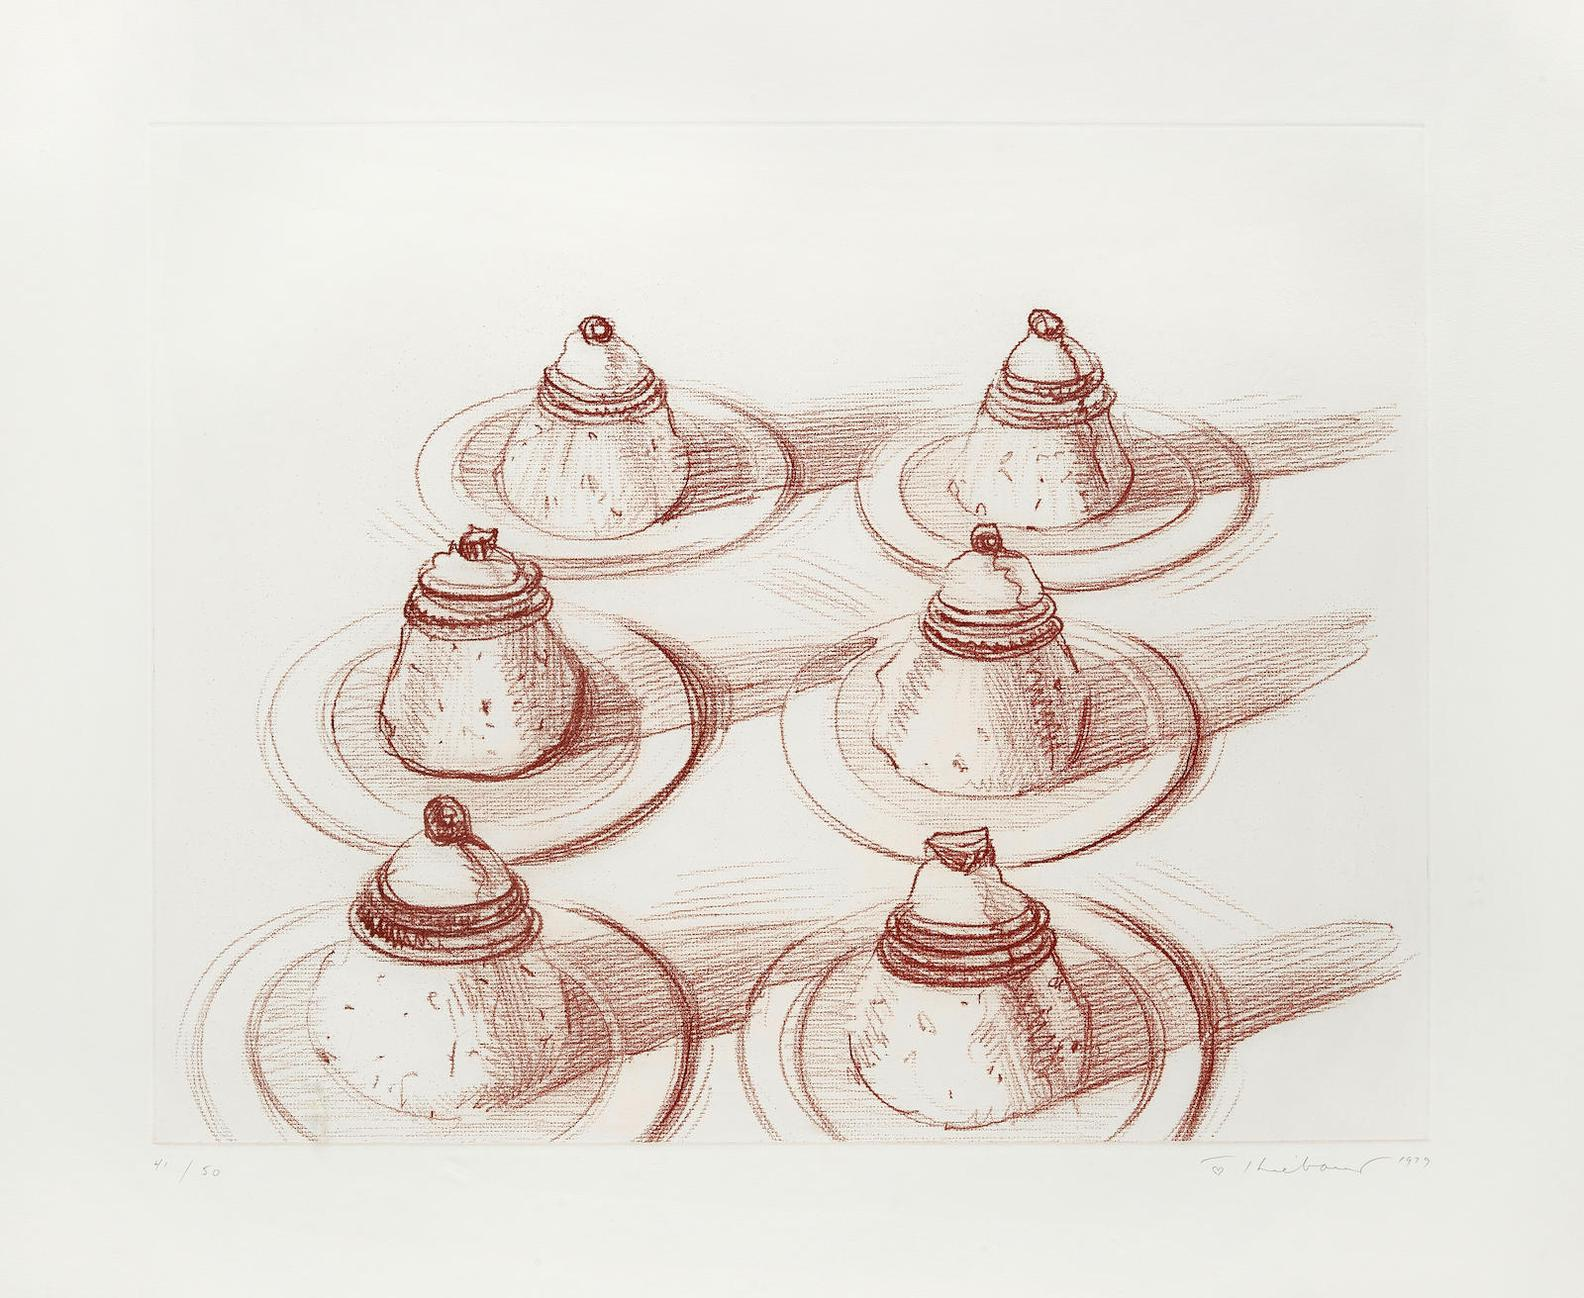 Wayne Thiebaud-Six Italian Desserts, From Recent Etchings II-1979